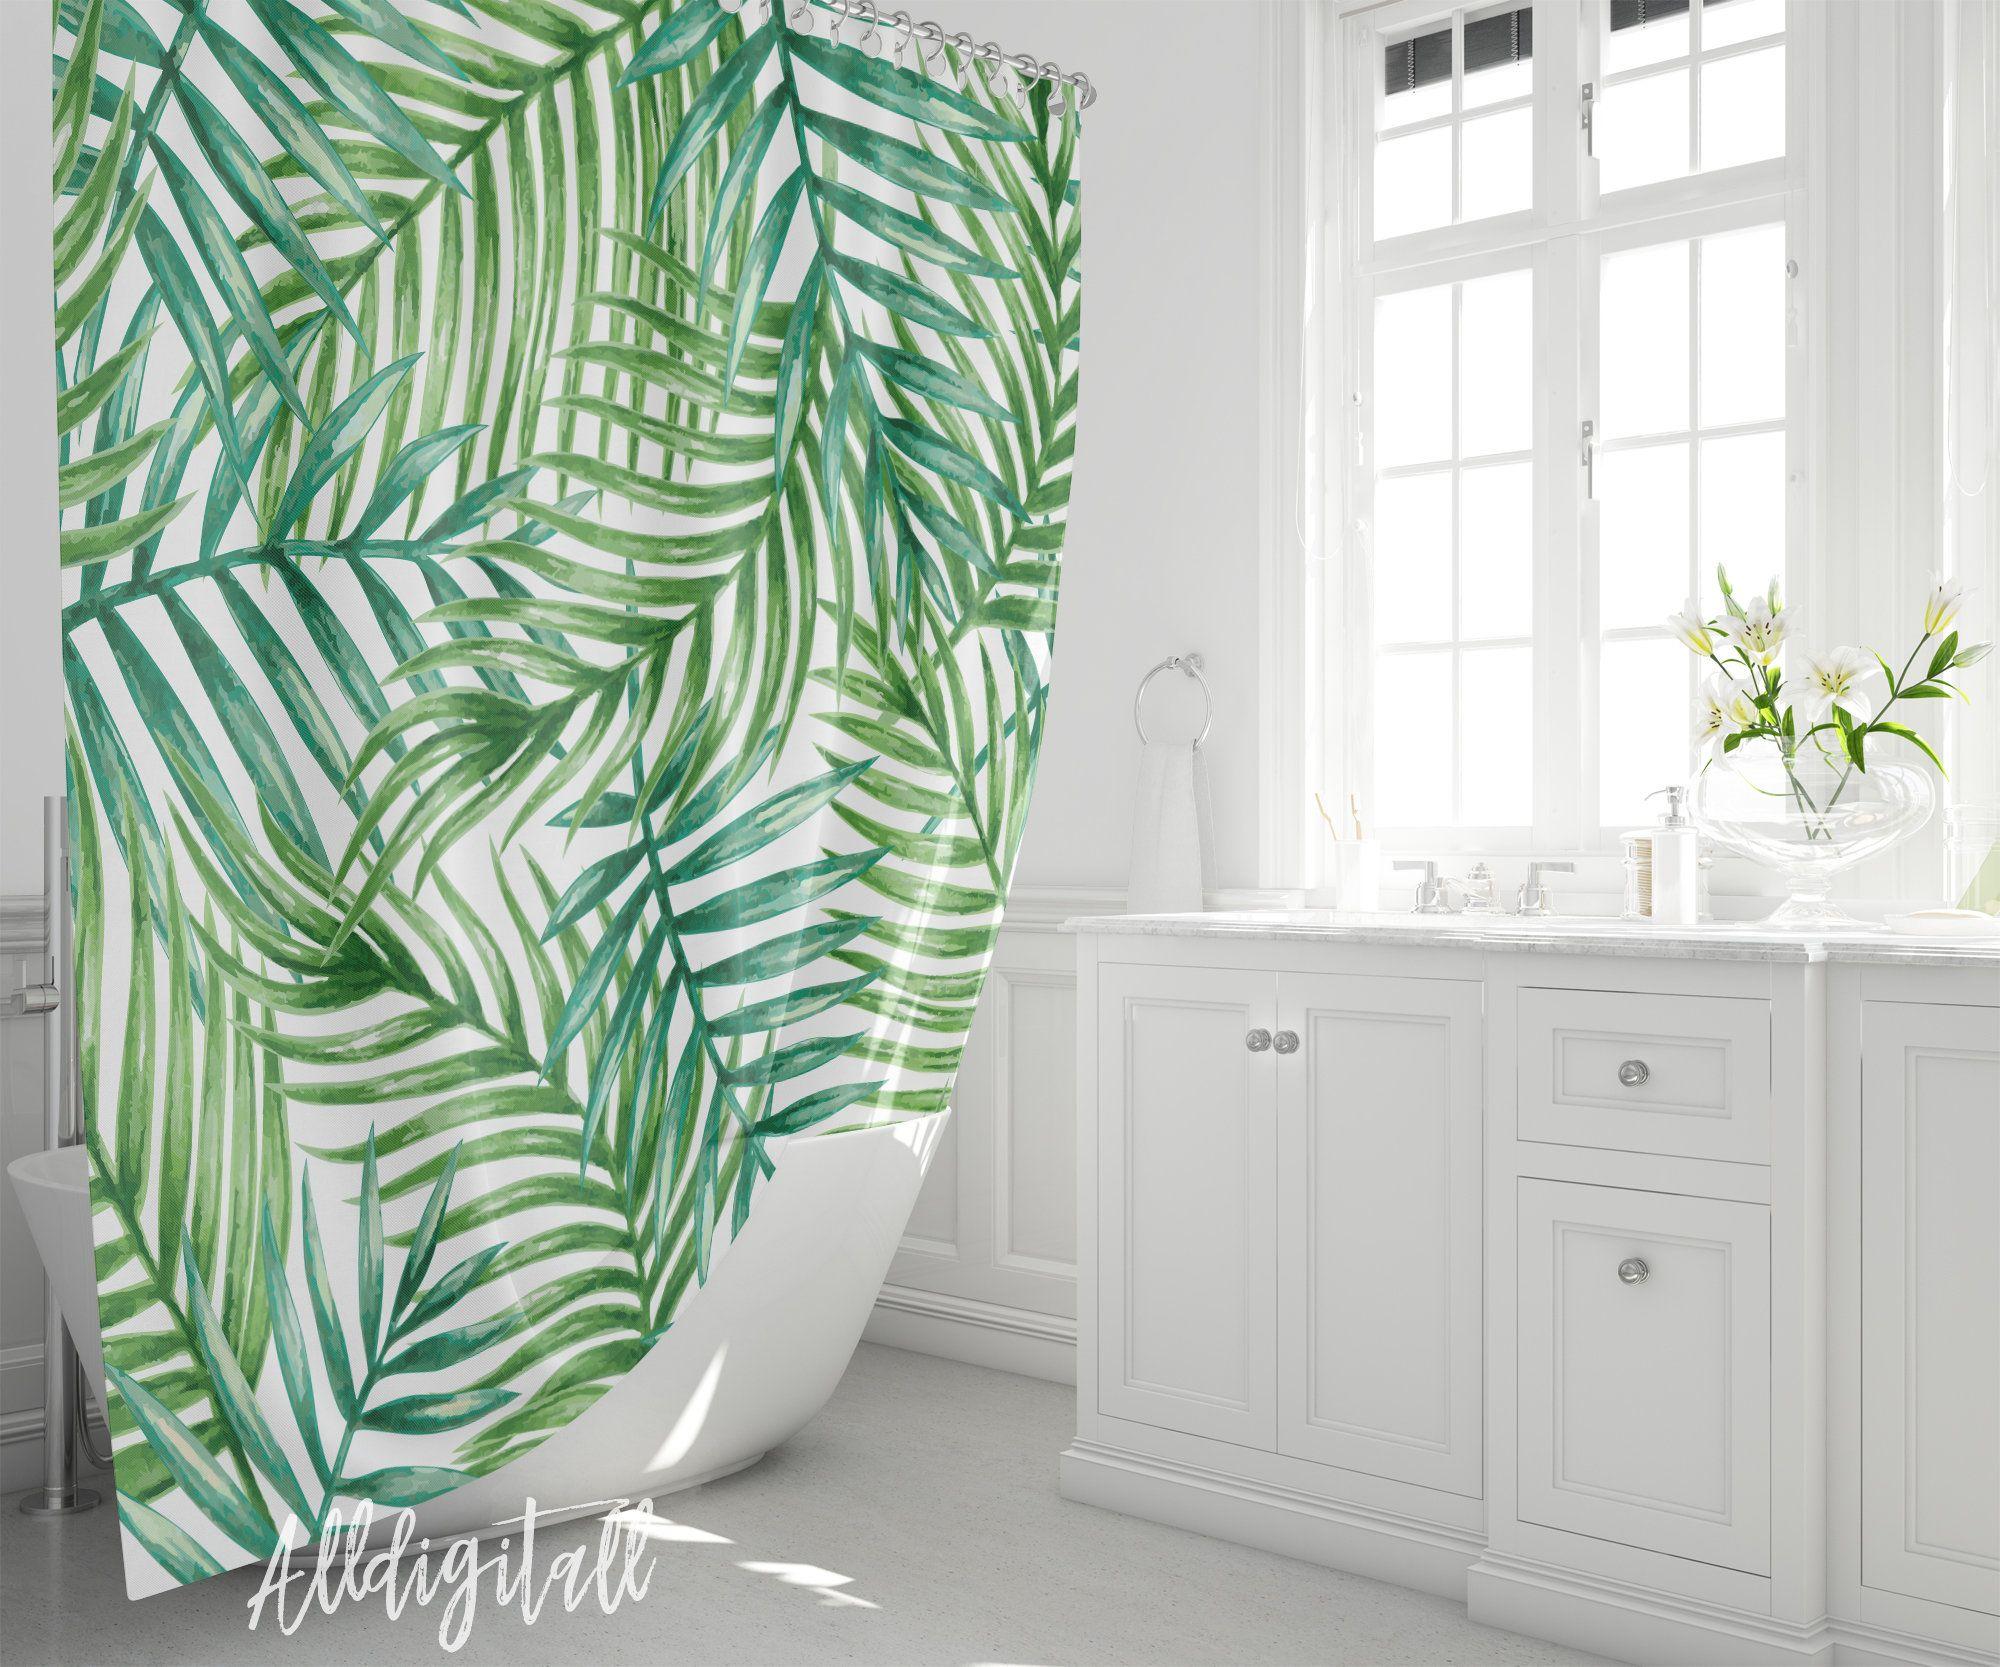 Tropical Shower Curtain Modern Bathroom Decor Green Leaves Etsy In 2020 Tropical Shower Curtains Tropical Showers Bathroom Decor